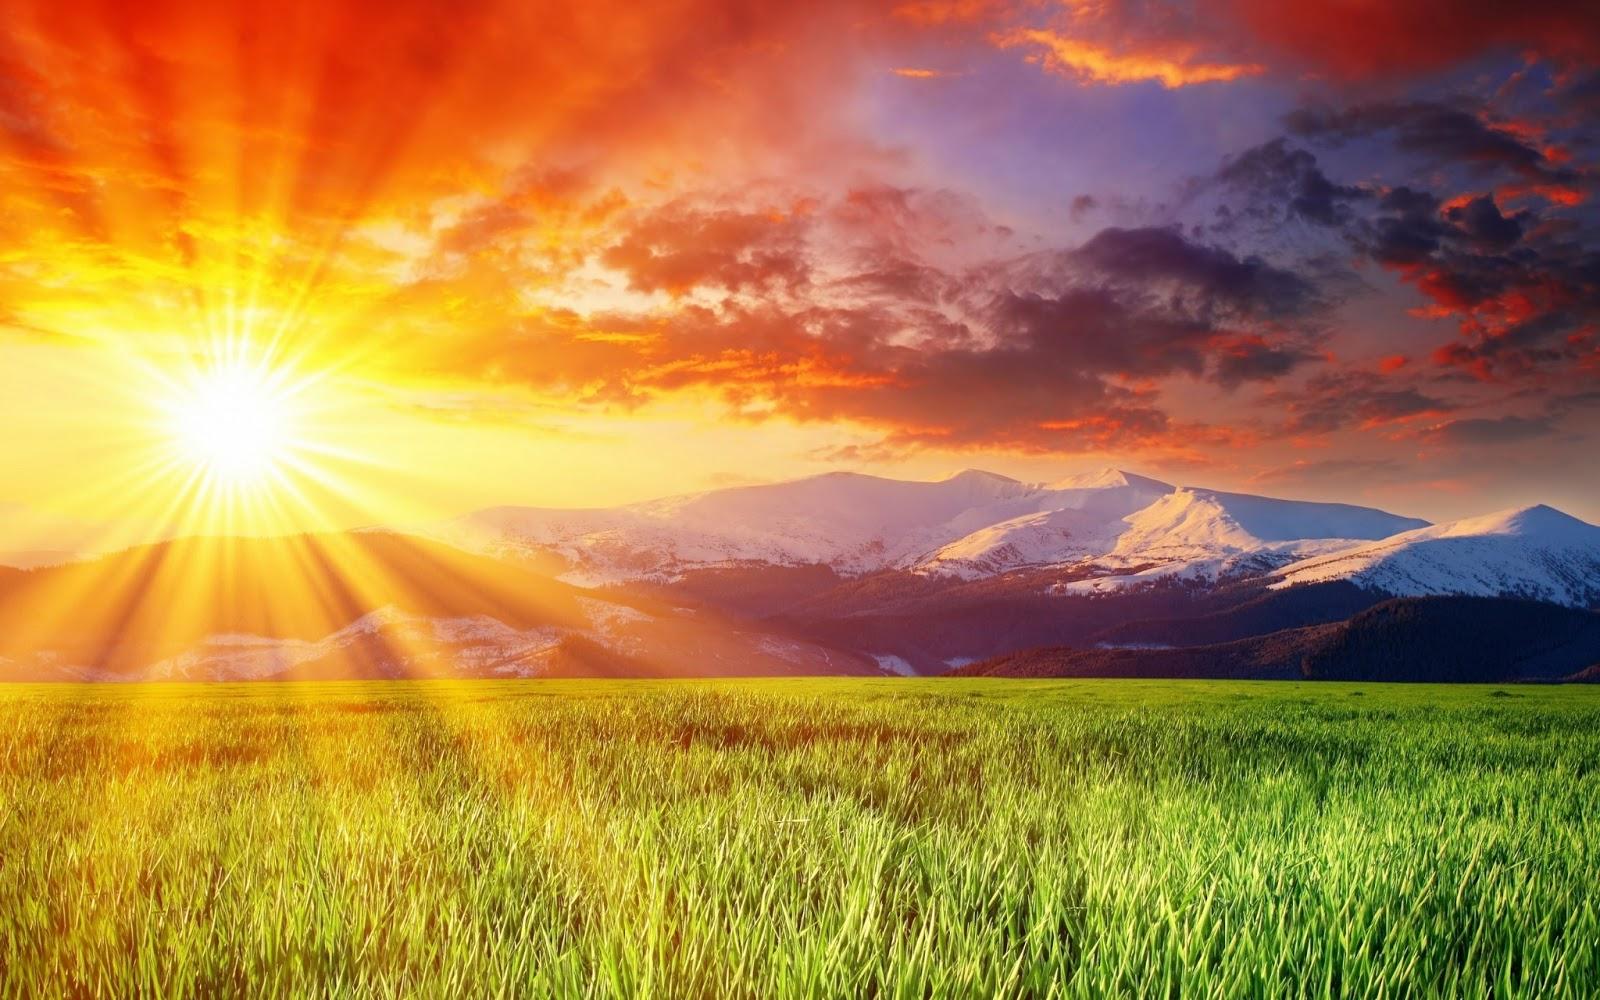 Free Download Beautiful Nature Hd Wallpapers 1080p Beautiful